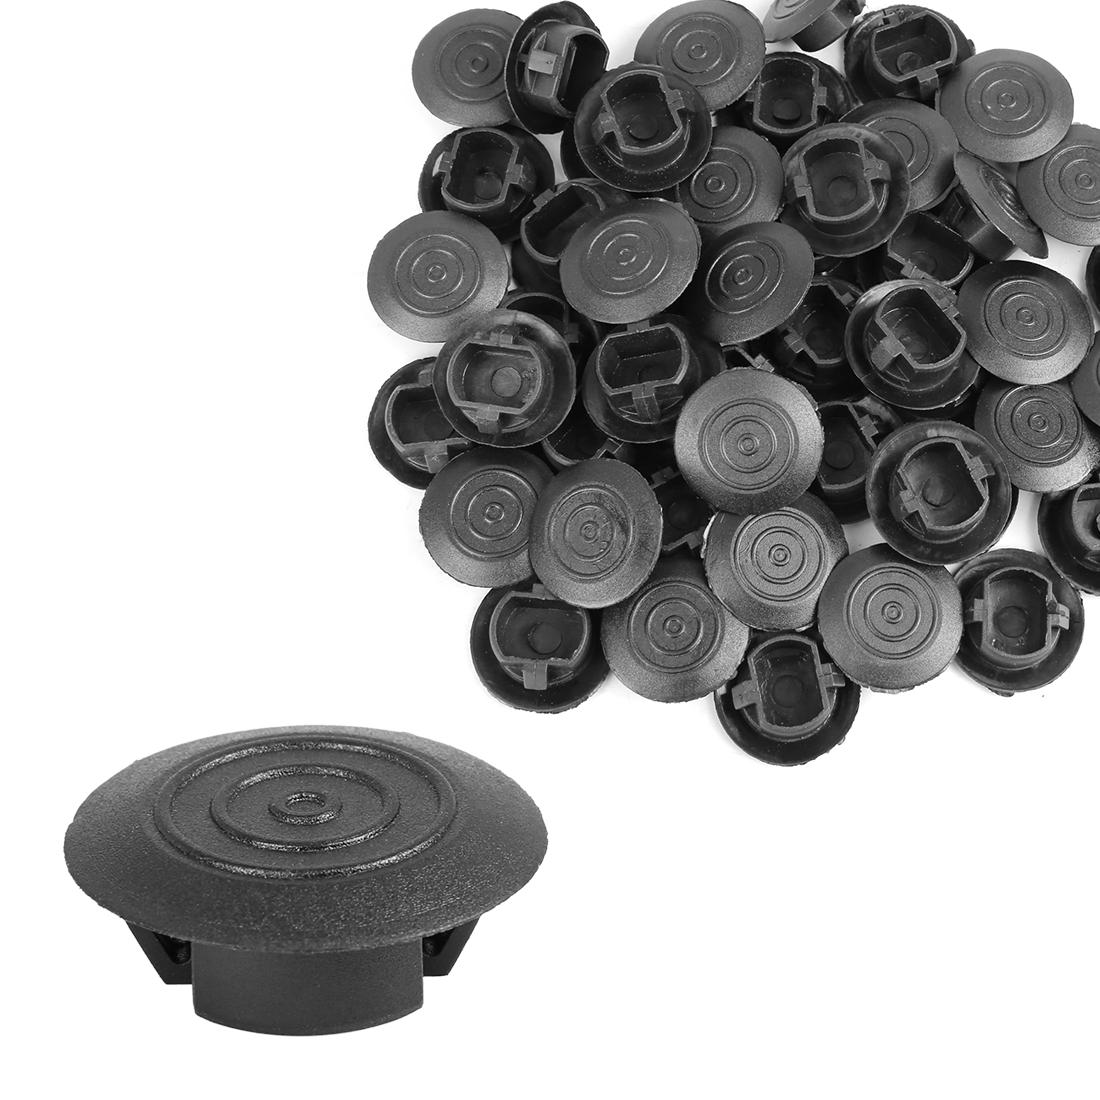 50pcs Nylon Panel Moulding Retainer Clips for Toyota Scion Pontiac 76924-52021